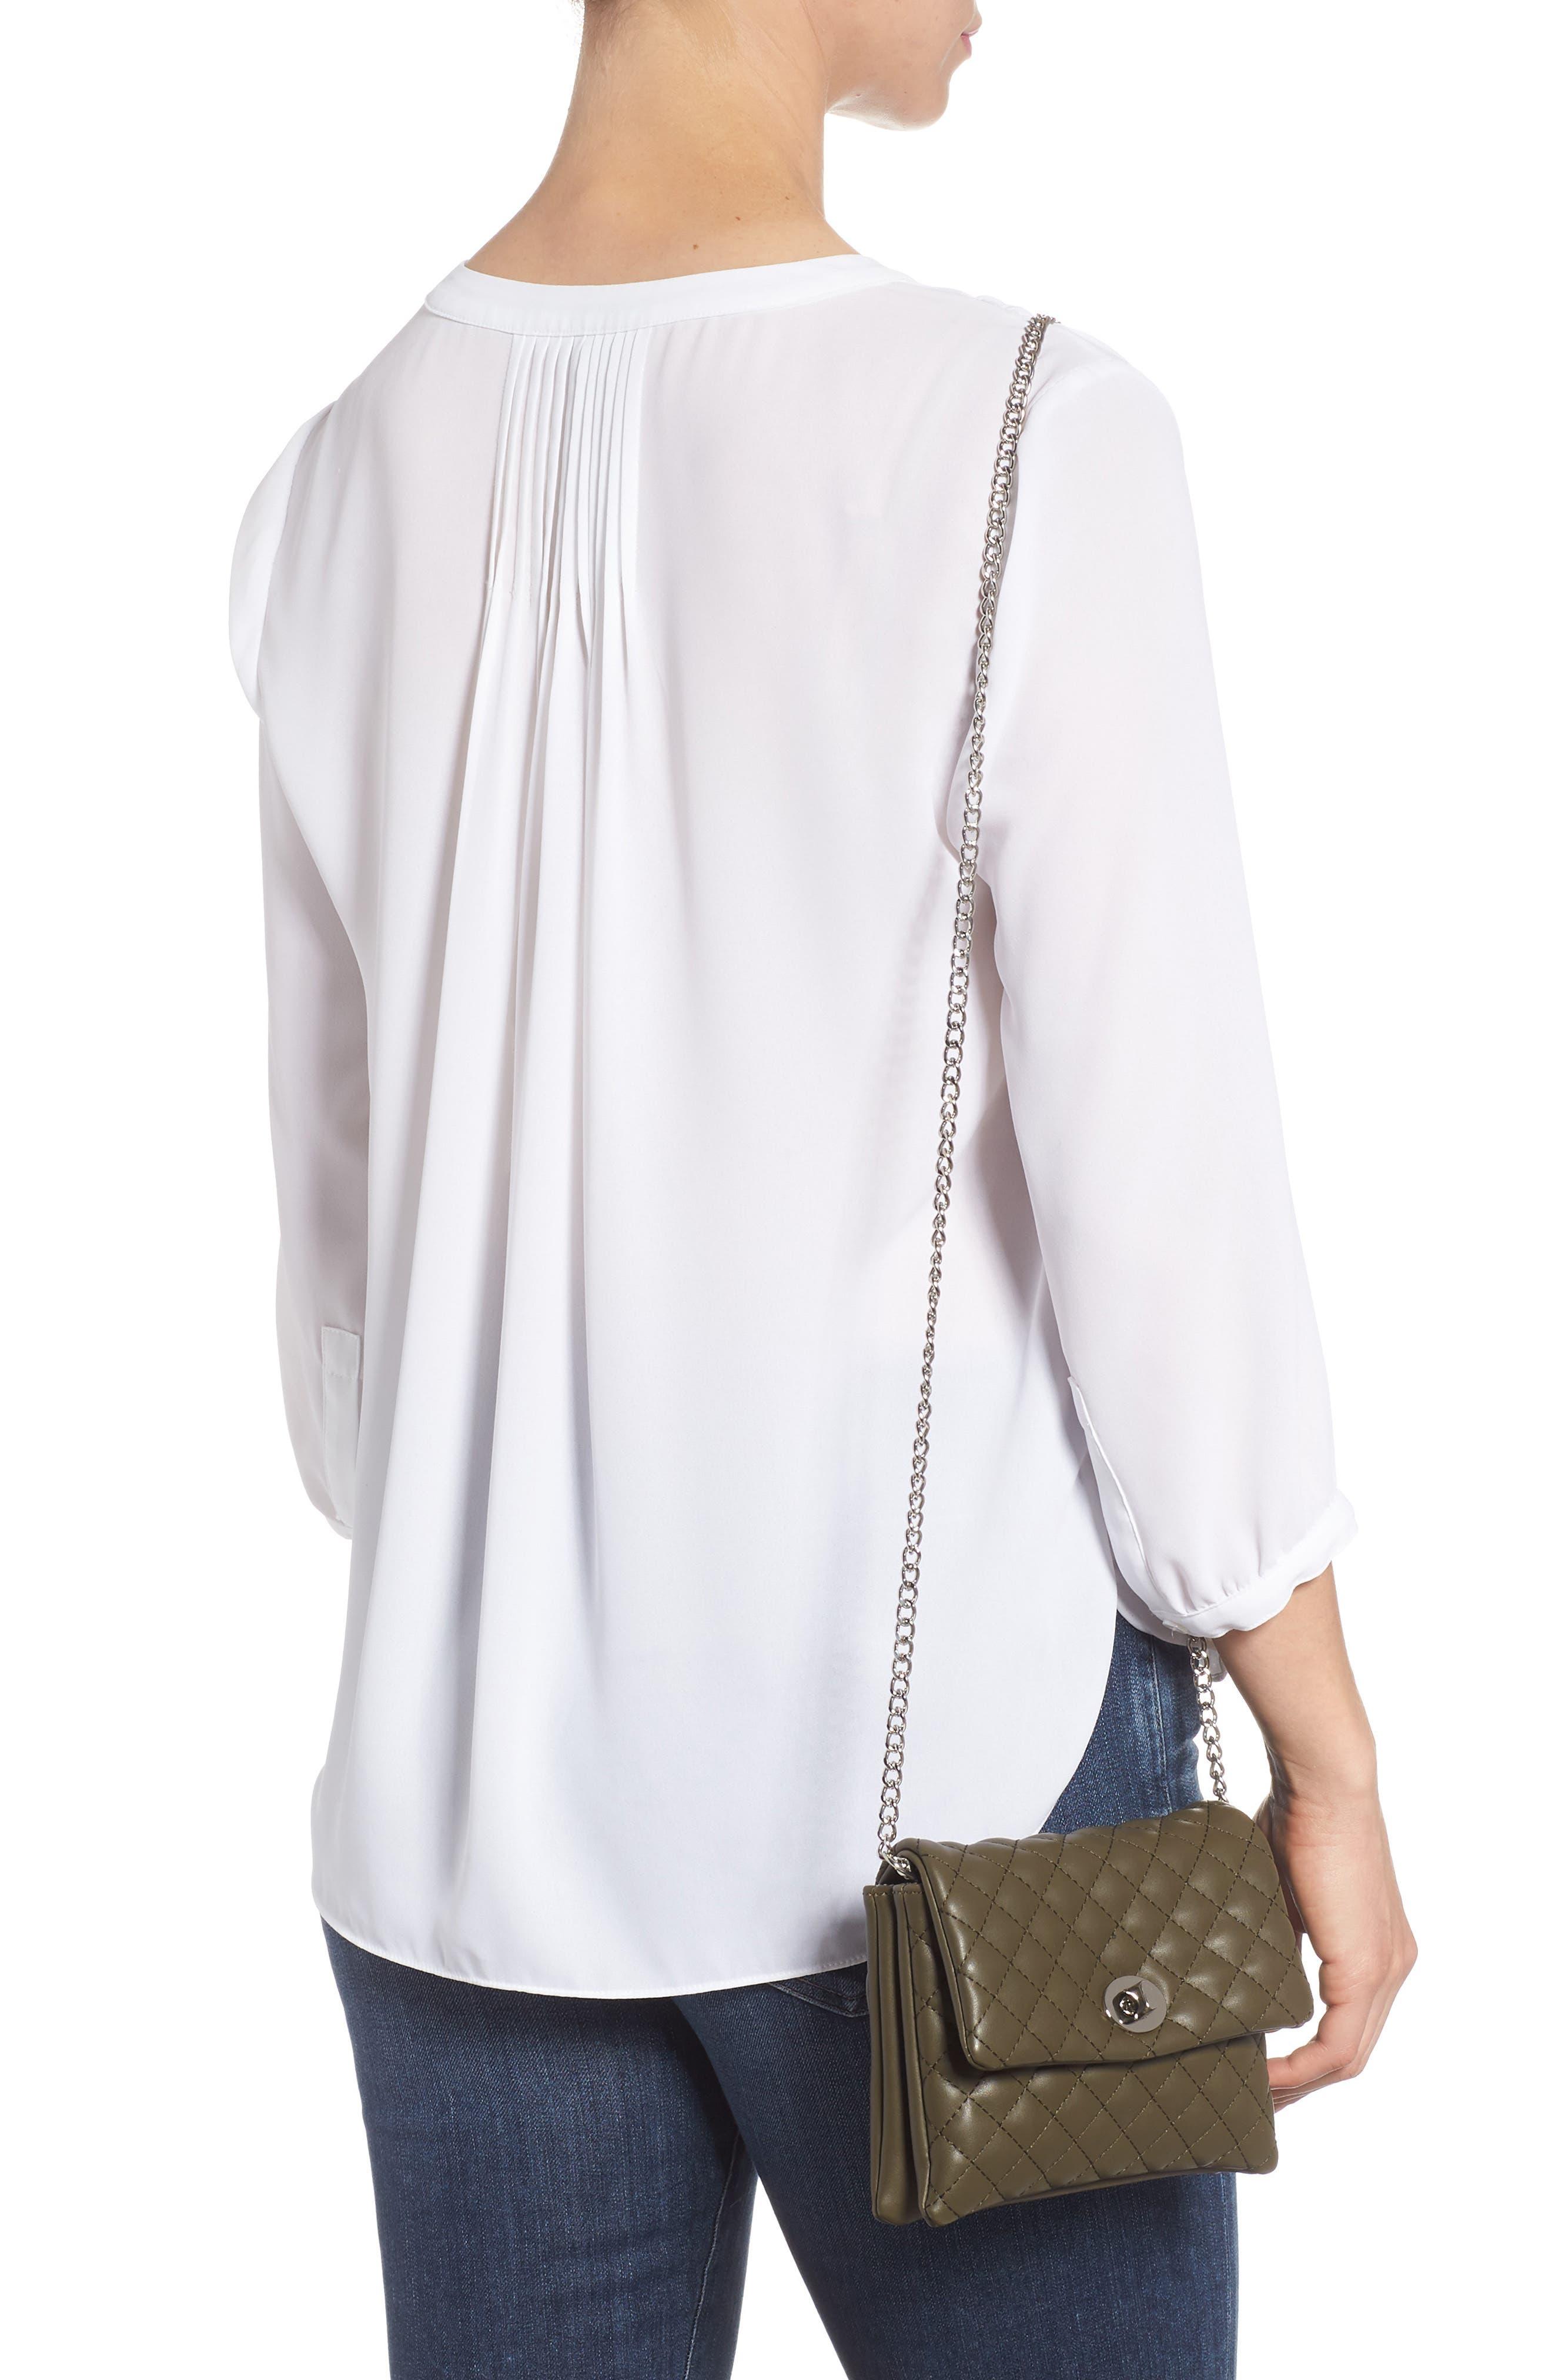 Mali + Lili Quilted Vegan Leather Convertible Belt Bag,                             Alternate thumbnail 9, color,                             OLIVE